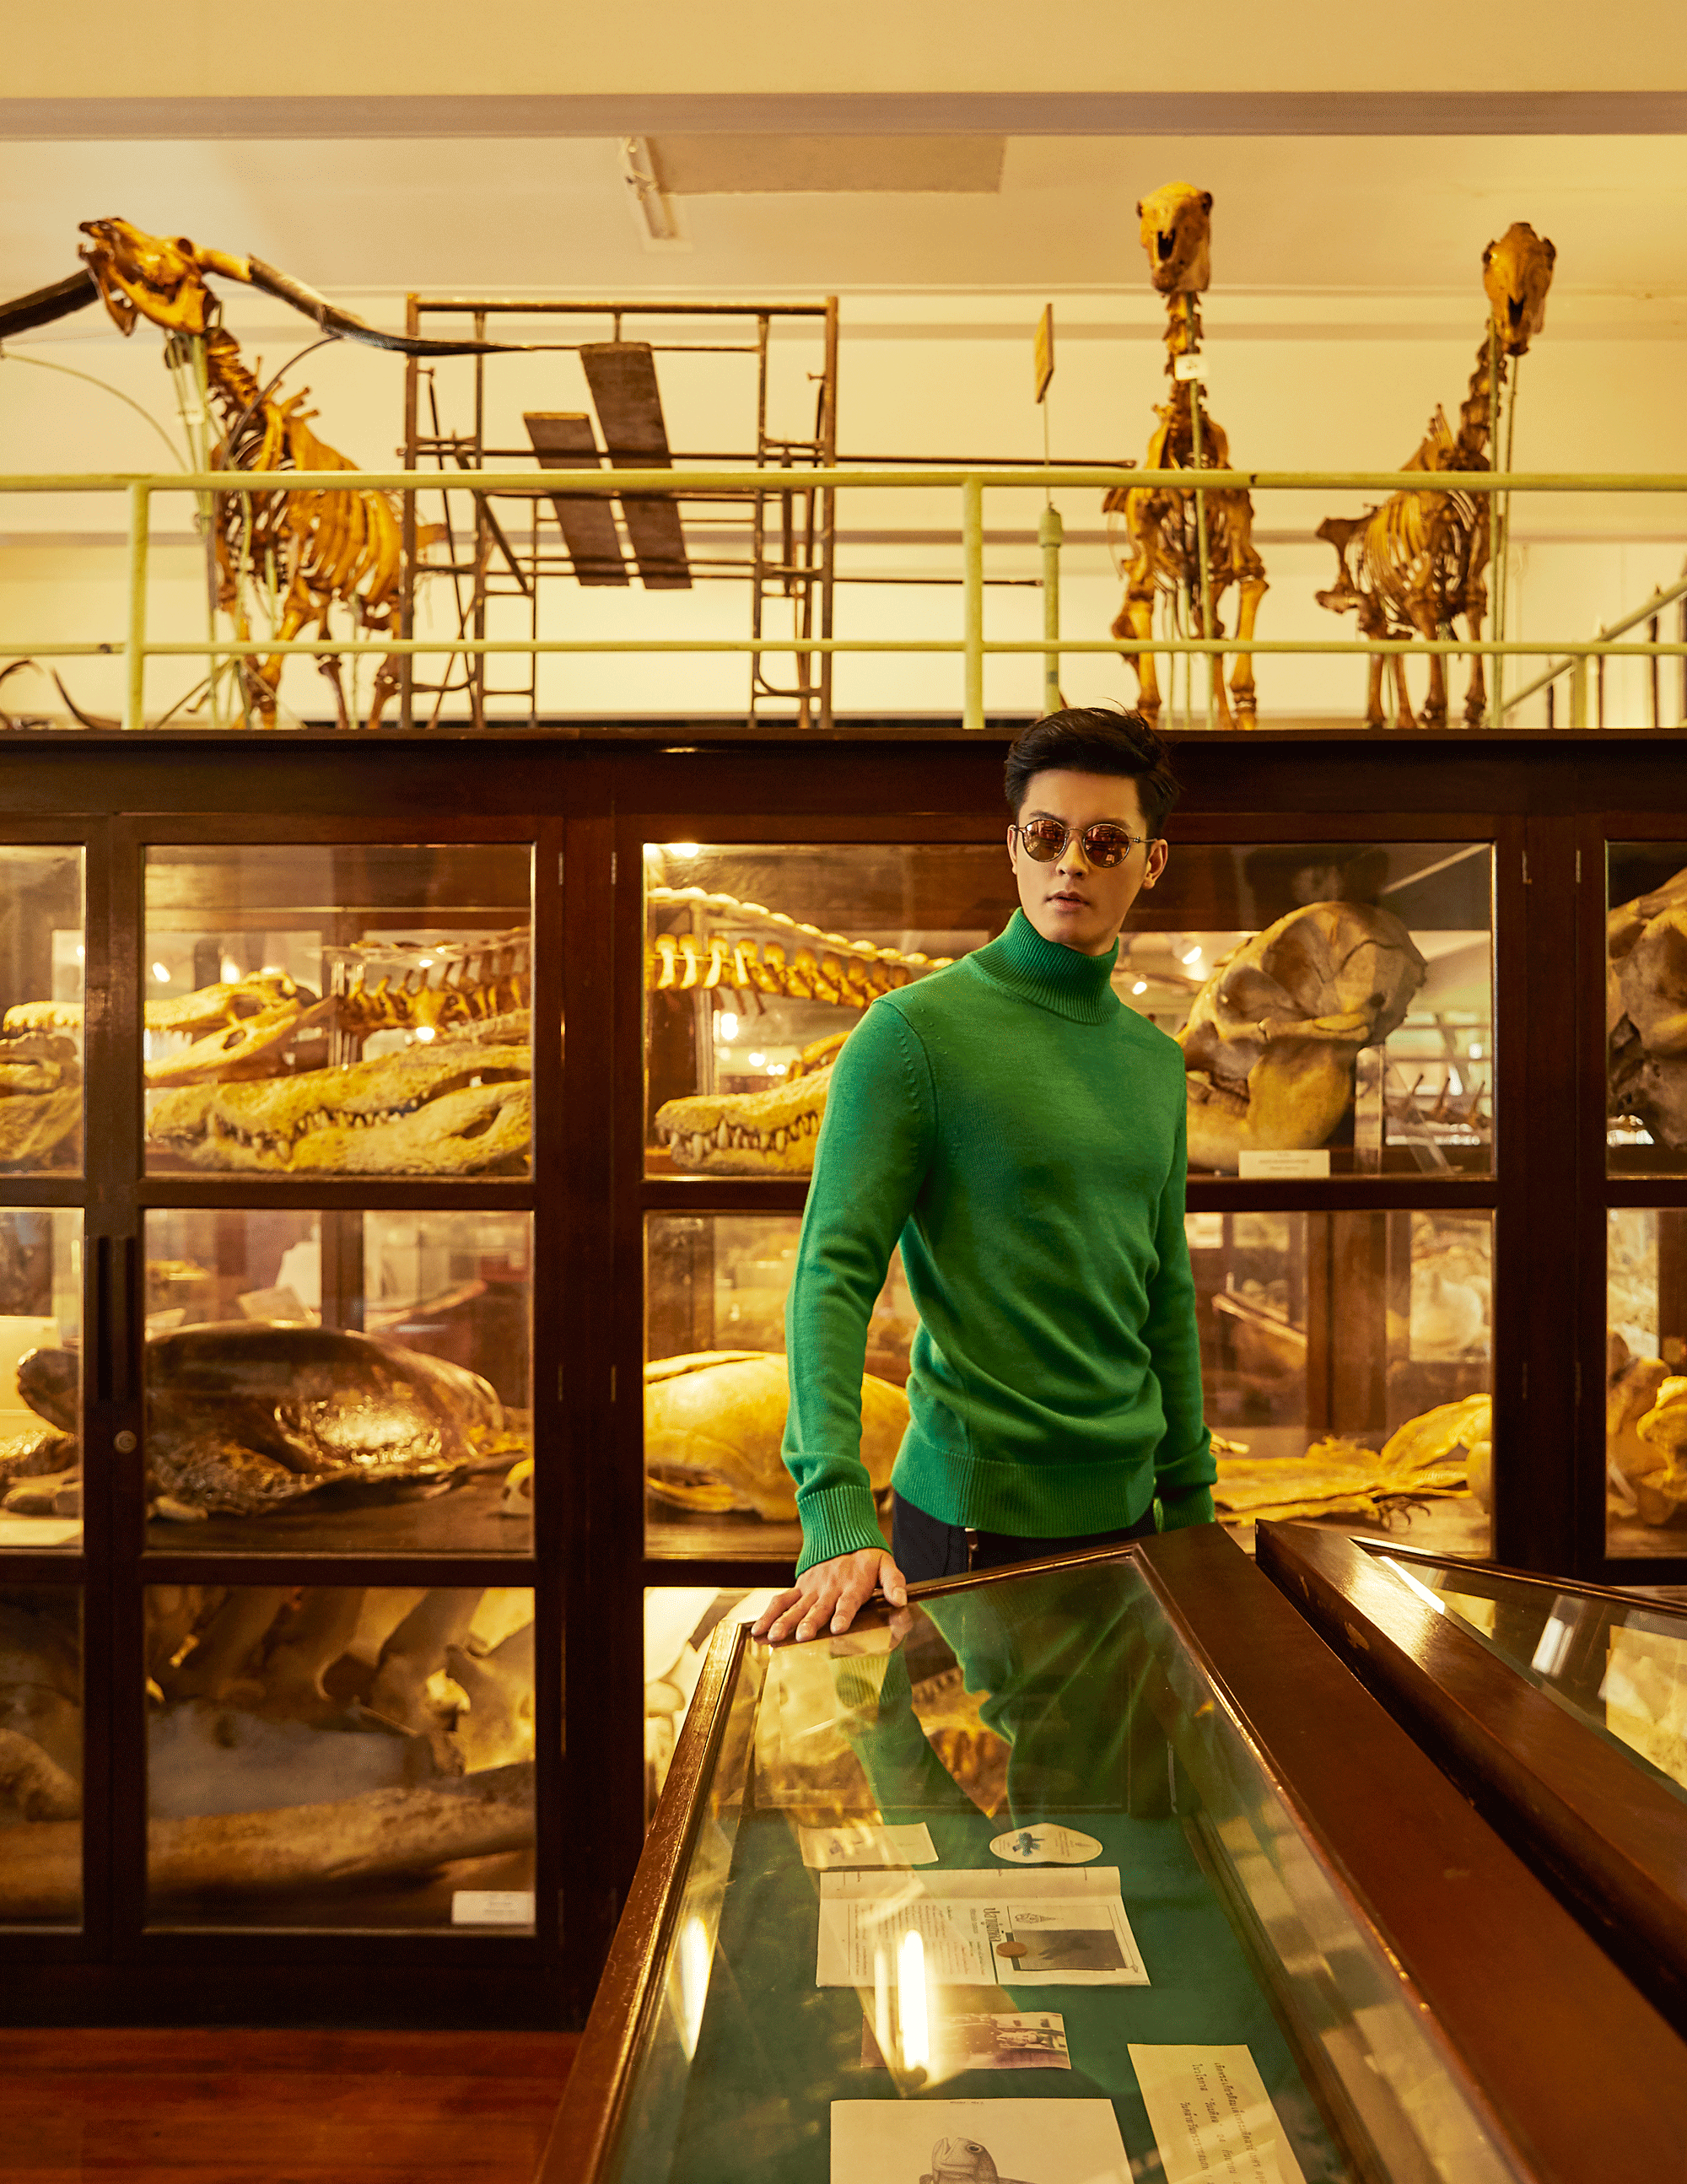 sweater : CK Calvin Klein / pants : Emporio Armani / sunglasses : TAVAT